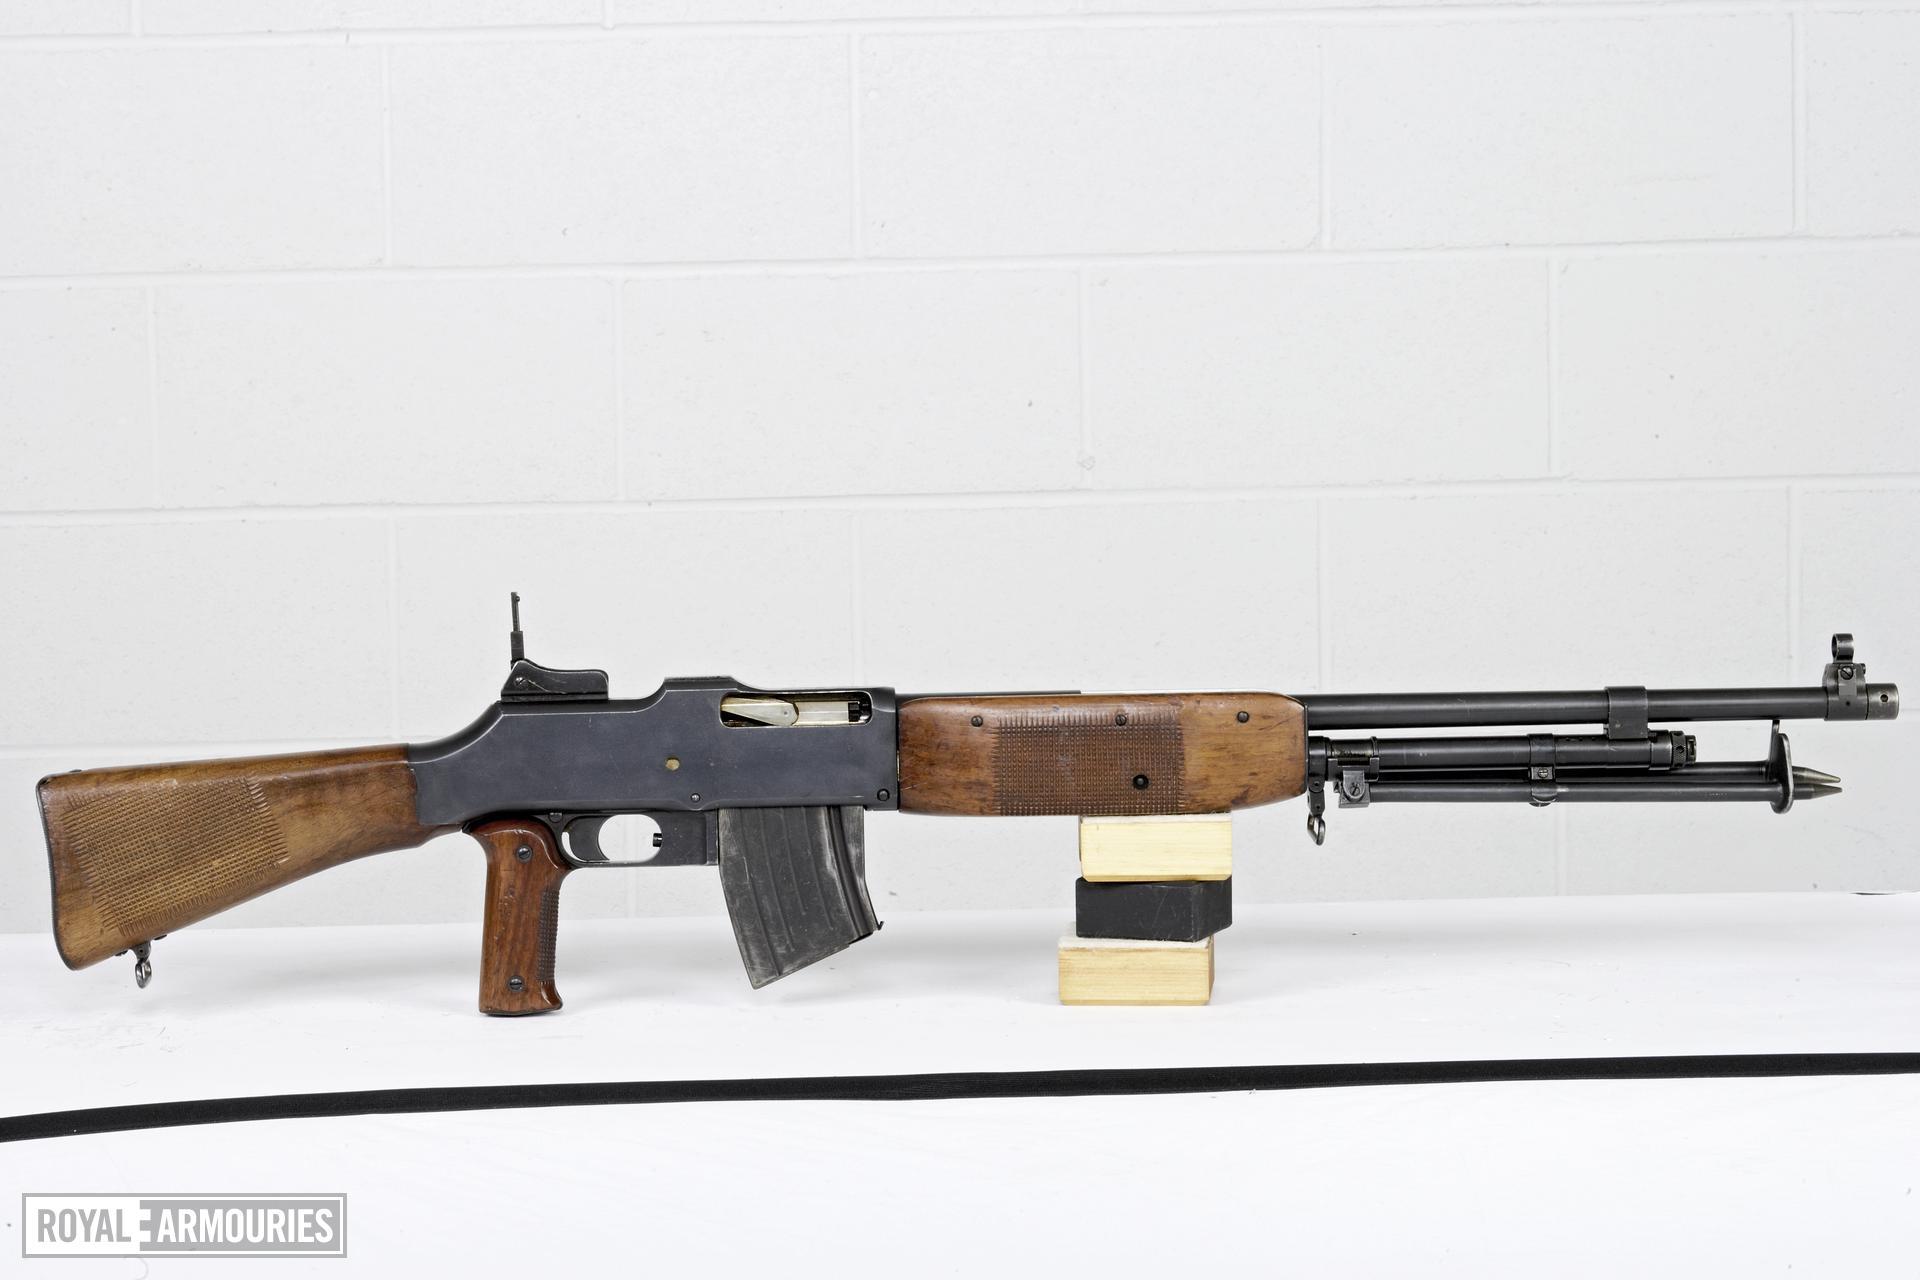 Centrefire automatic light machine gun - Browning Model 1921